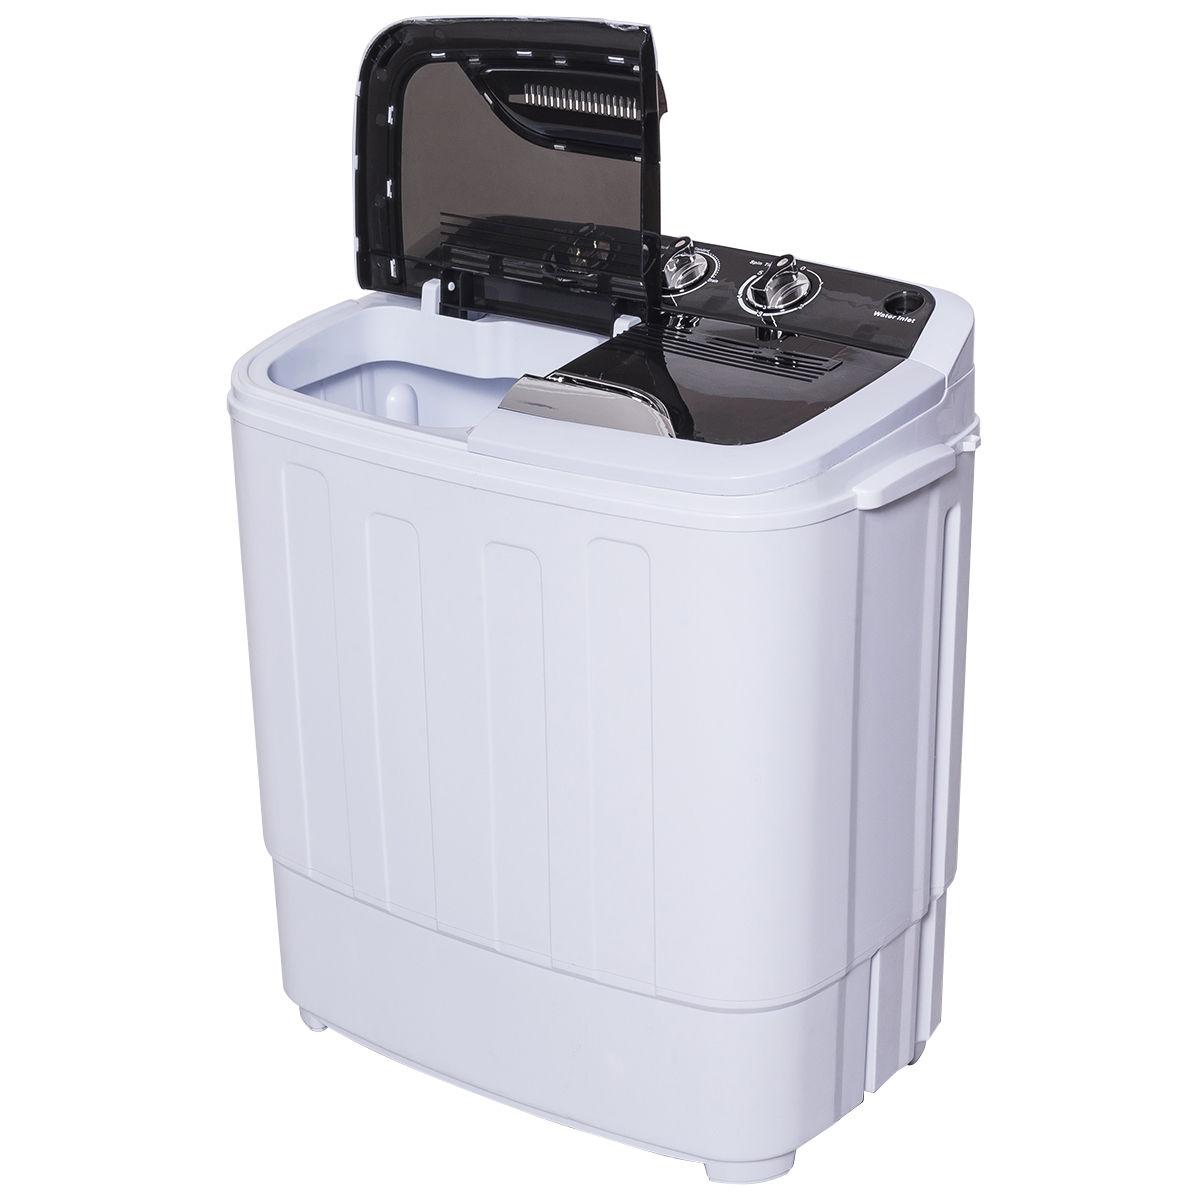 8 lbs Compact Mini Twin Tub Washing Machine Washer Spiner